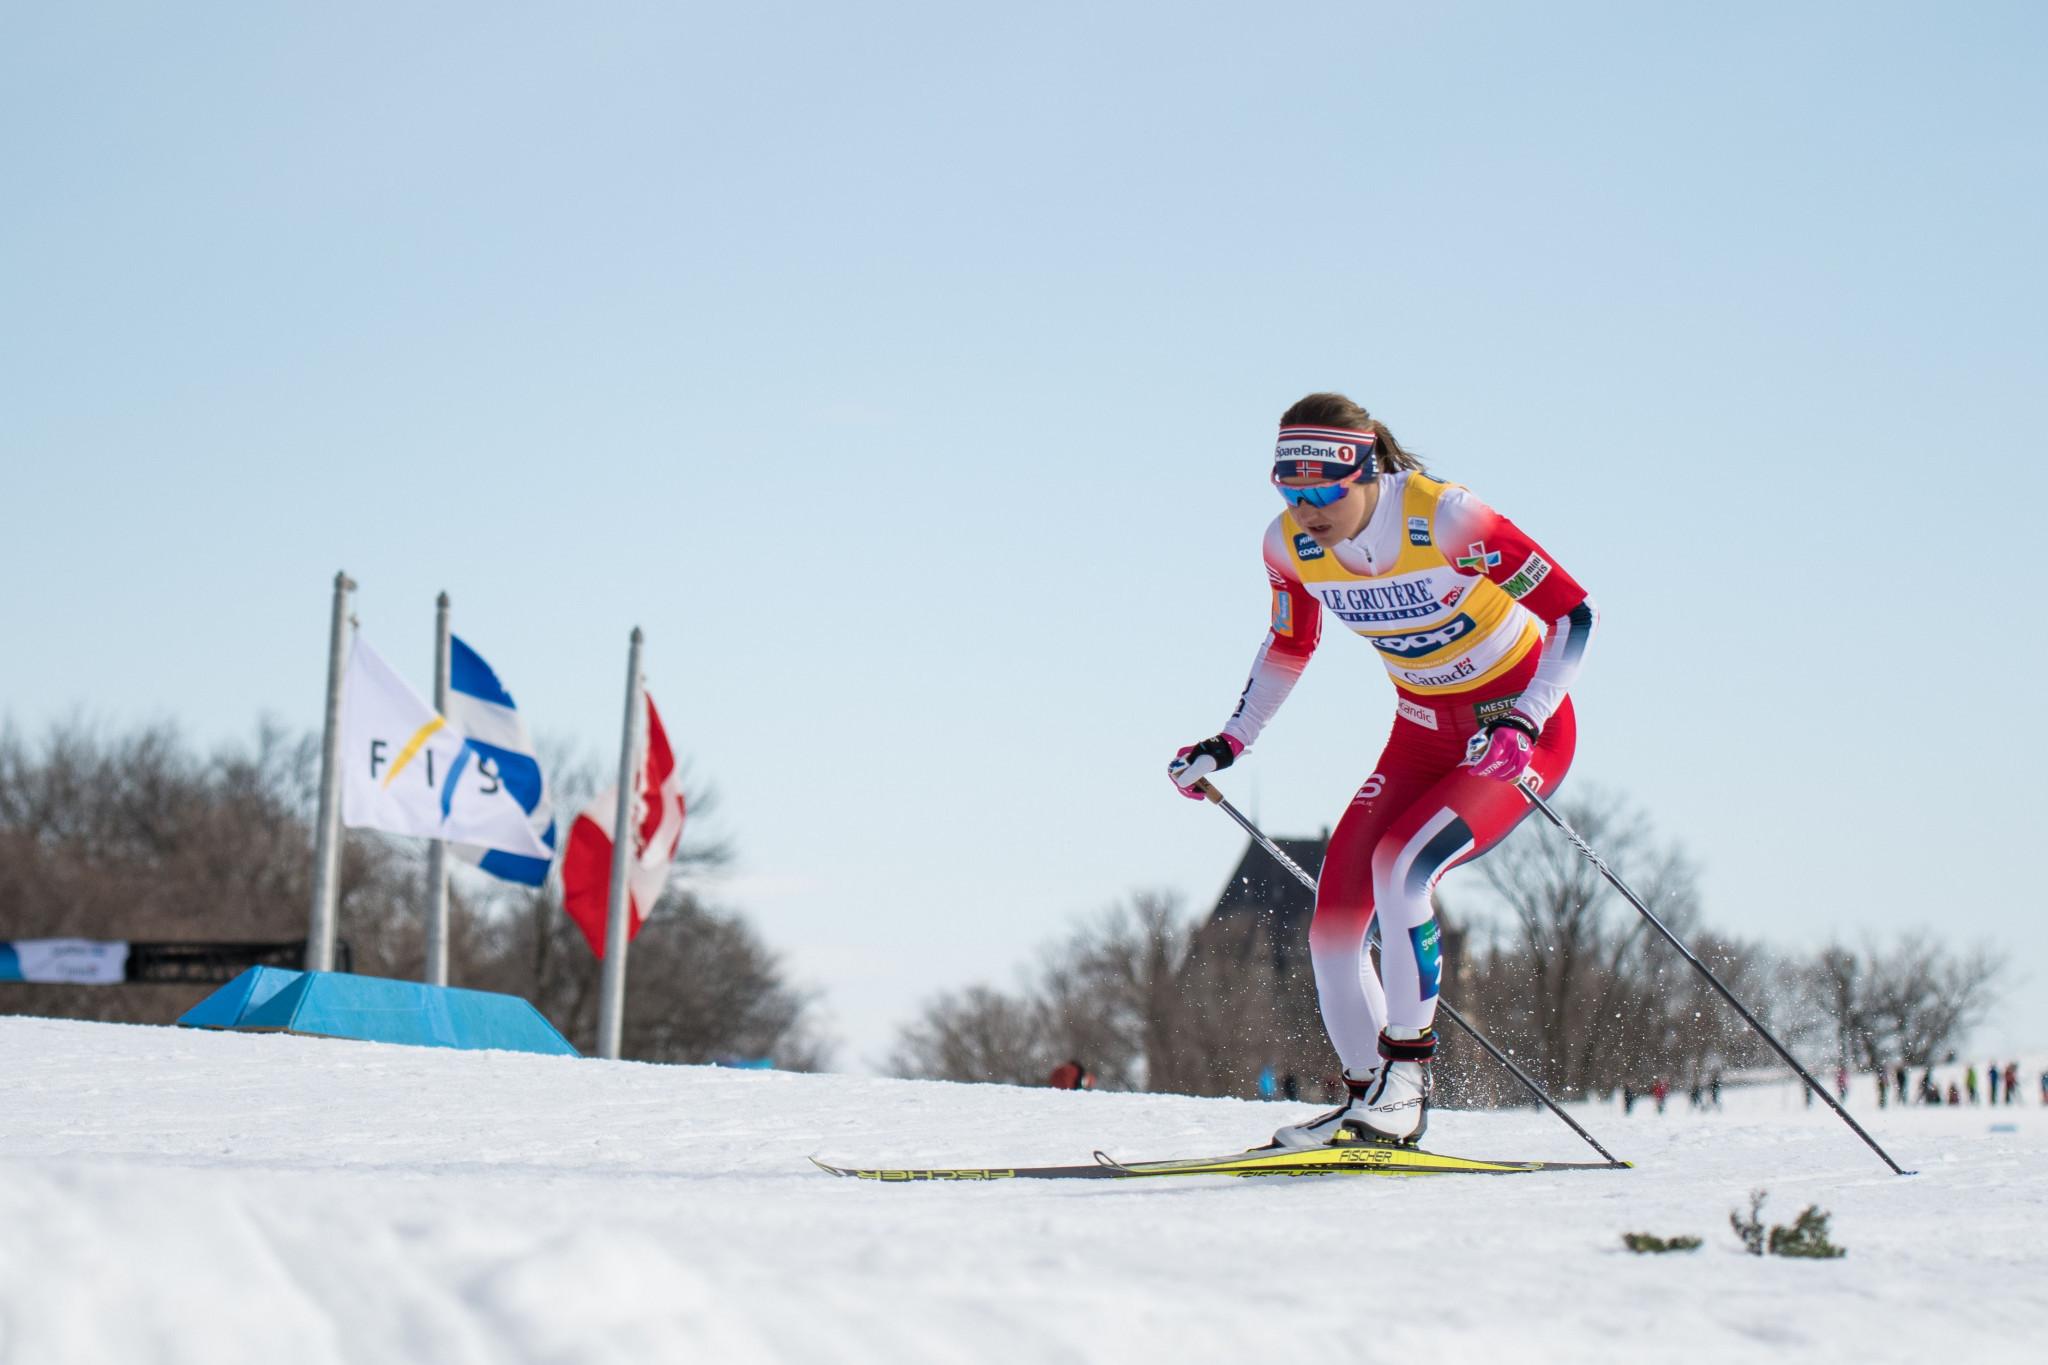 Østberg to make return to action at FIS Tour de Ski